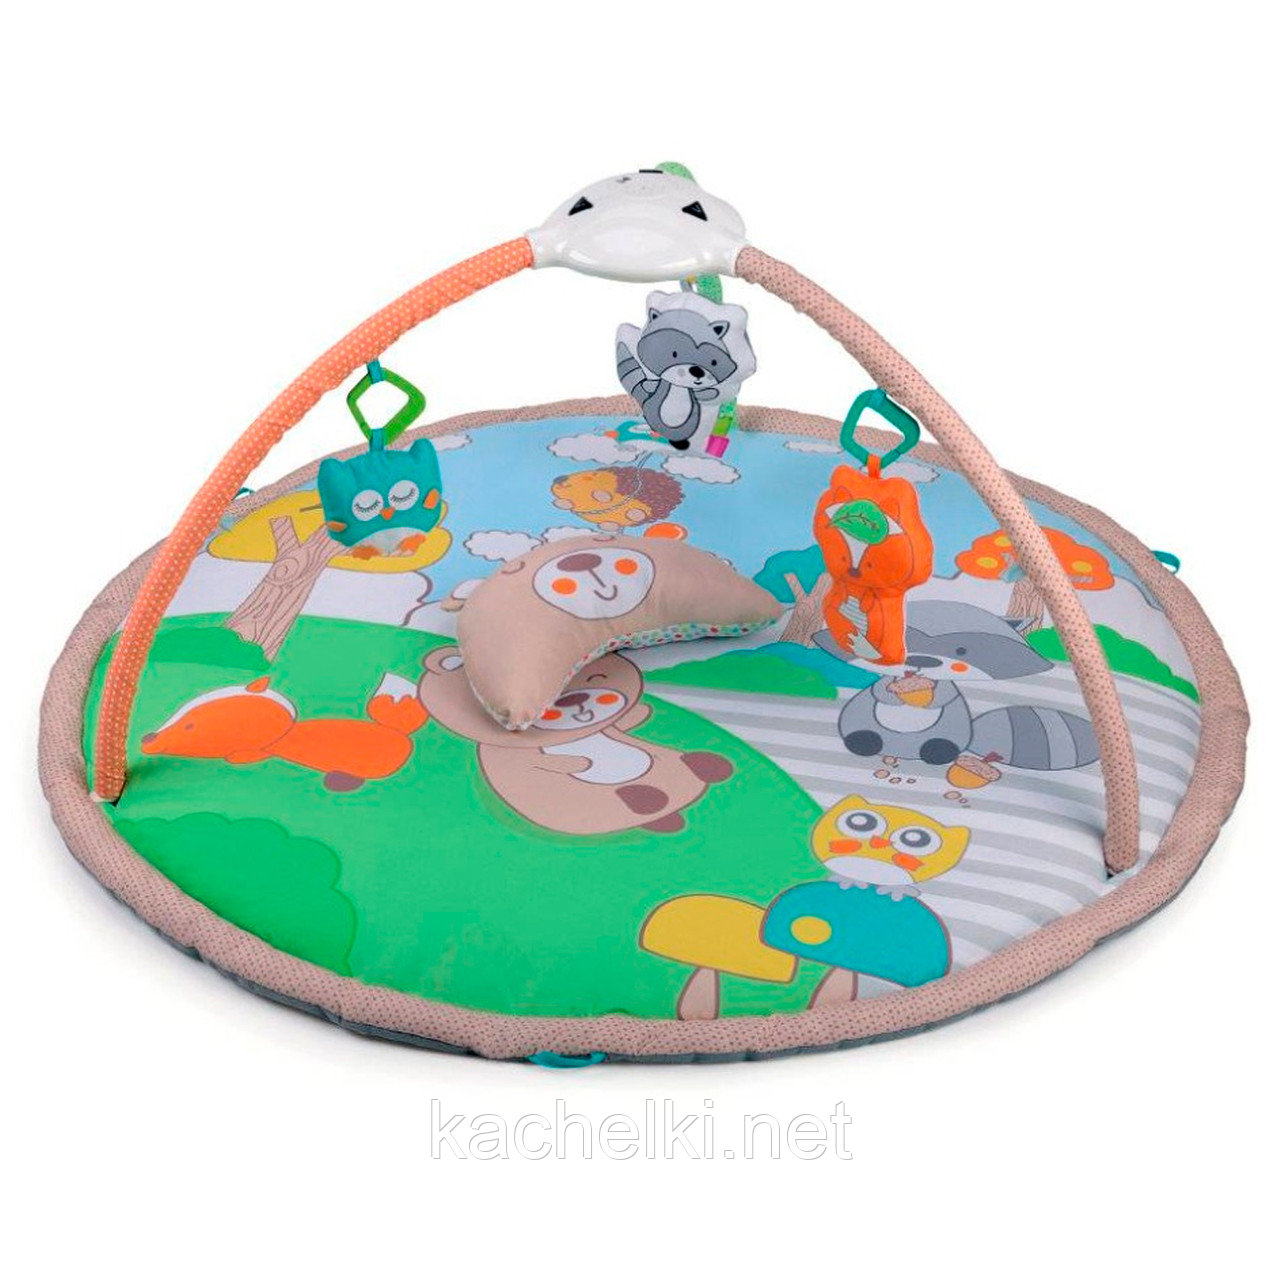 "Развивающий коврик ""Дружба"" с проектором, 6 мел., свет, игрушки Konig Kids"